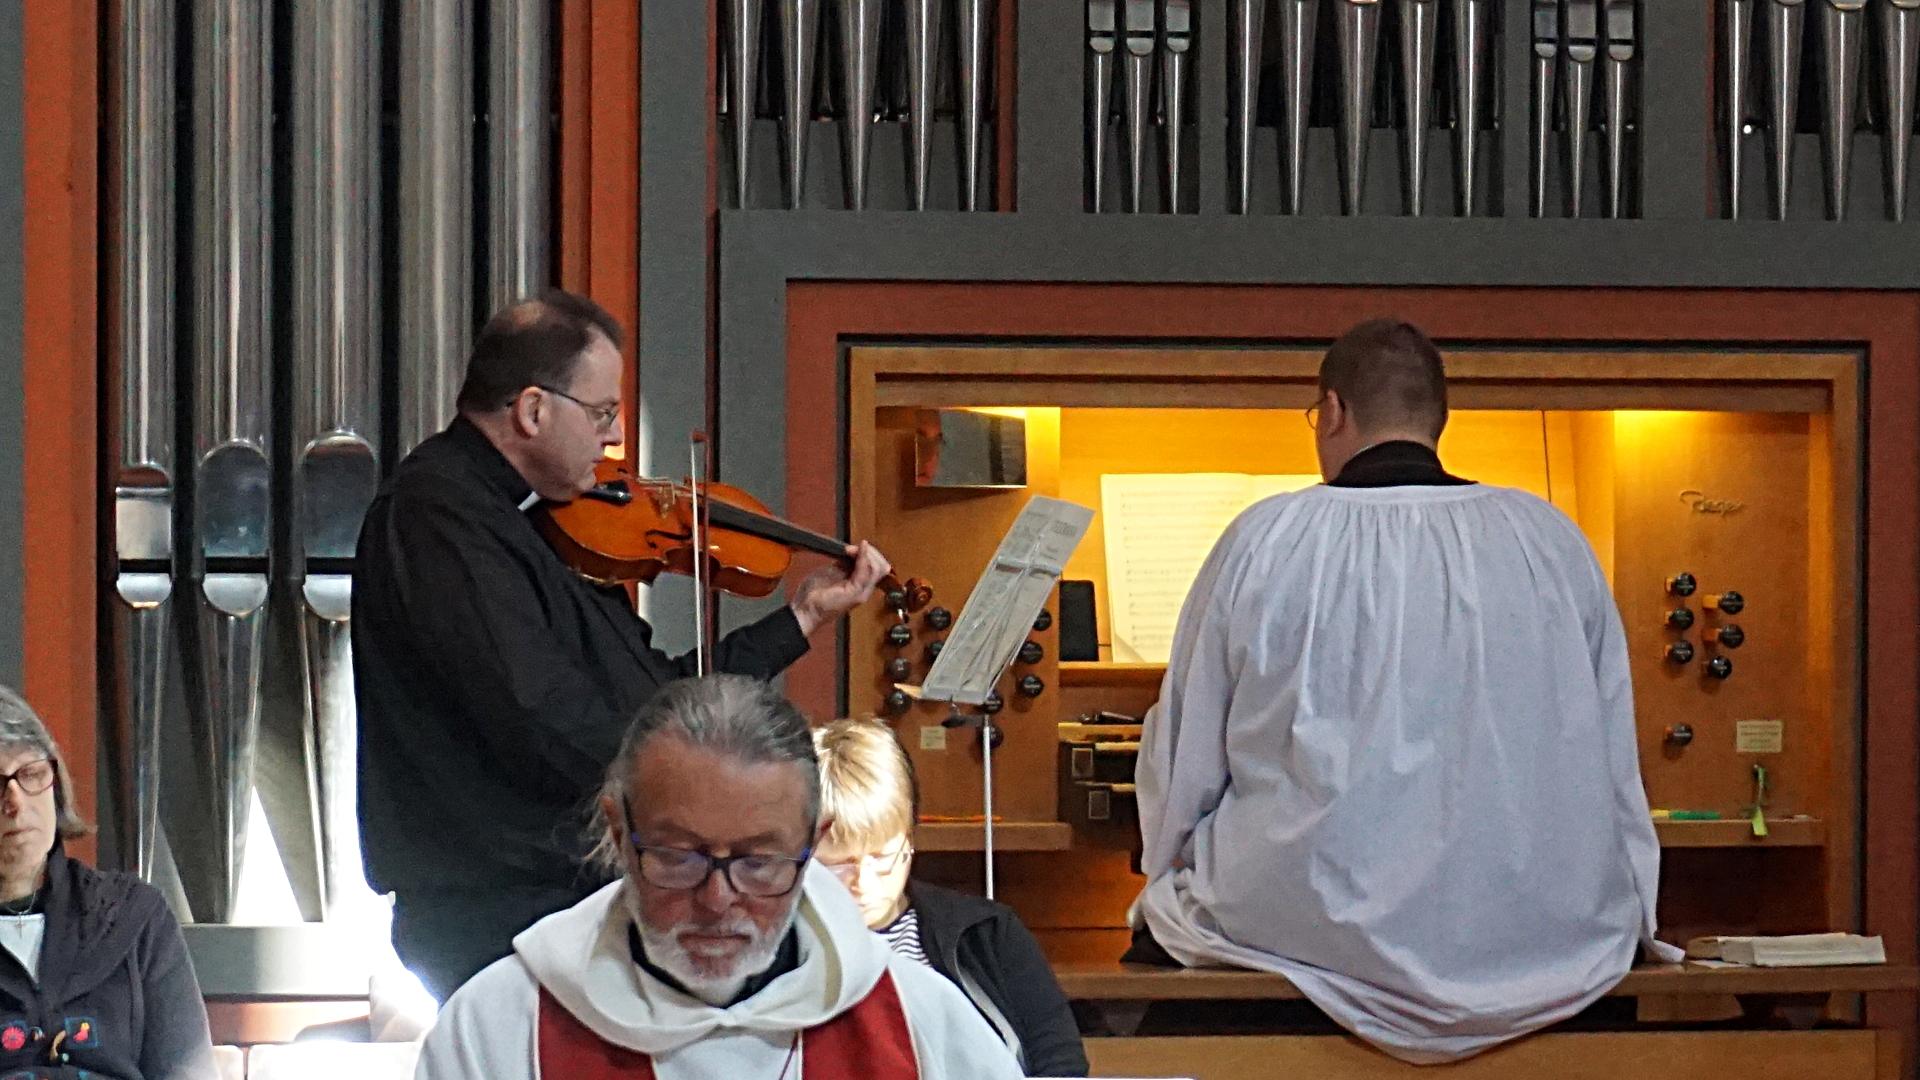 Kantor Organist Geige Presbyterweihe Priesterweihe 2017 SJB Johannesbruderschaft